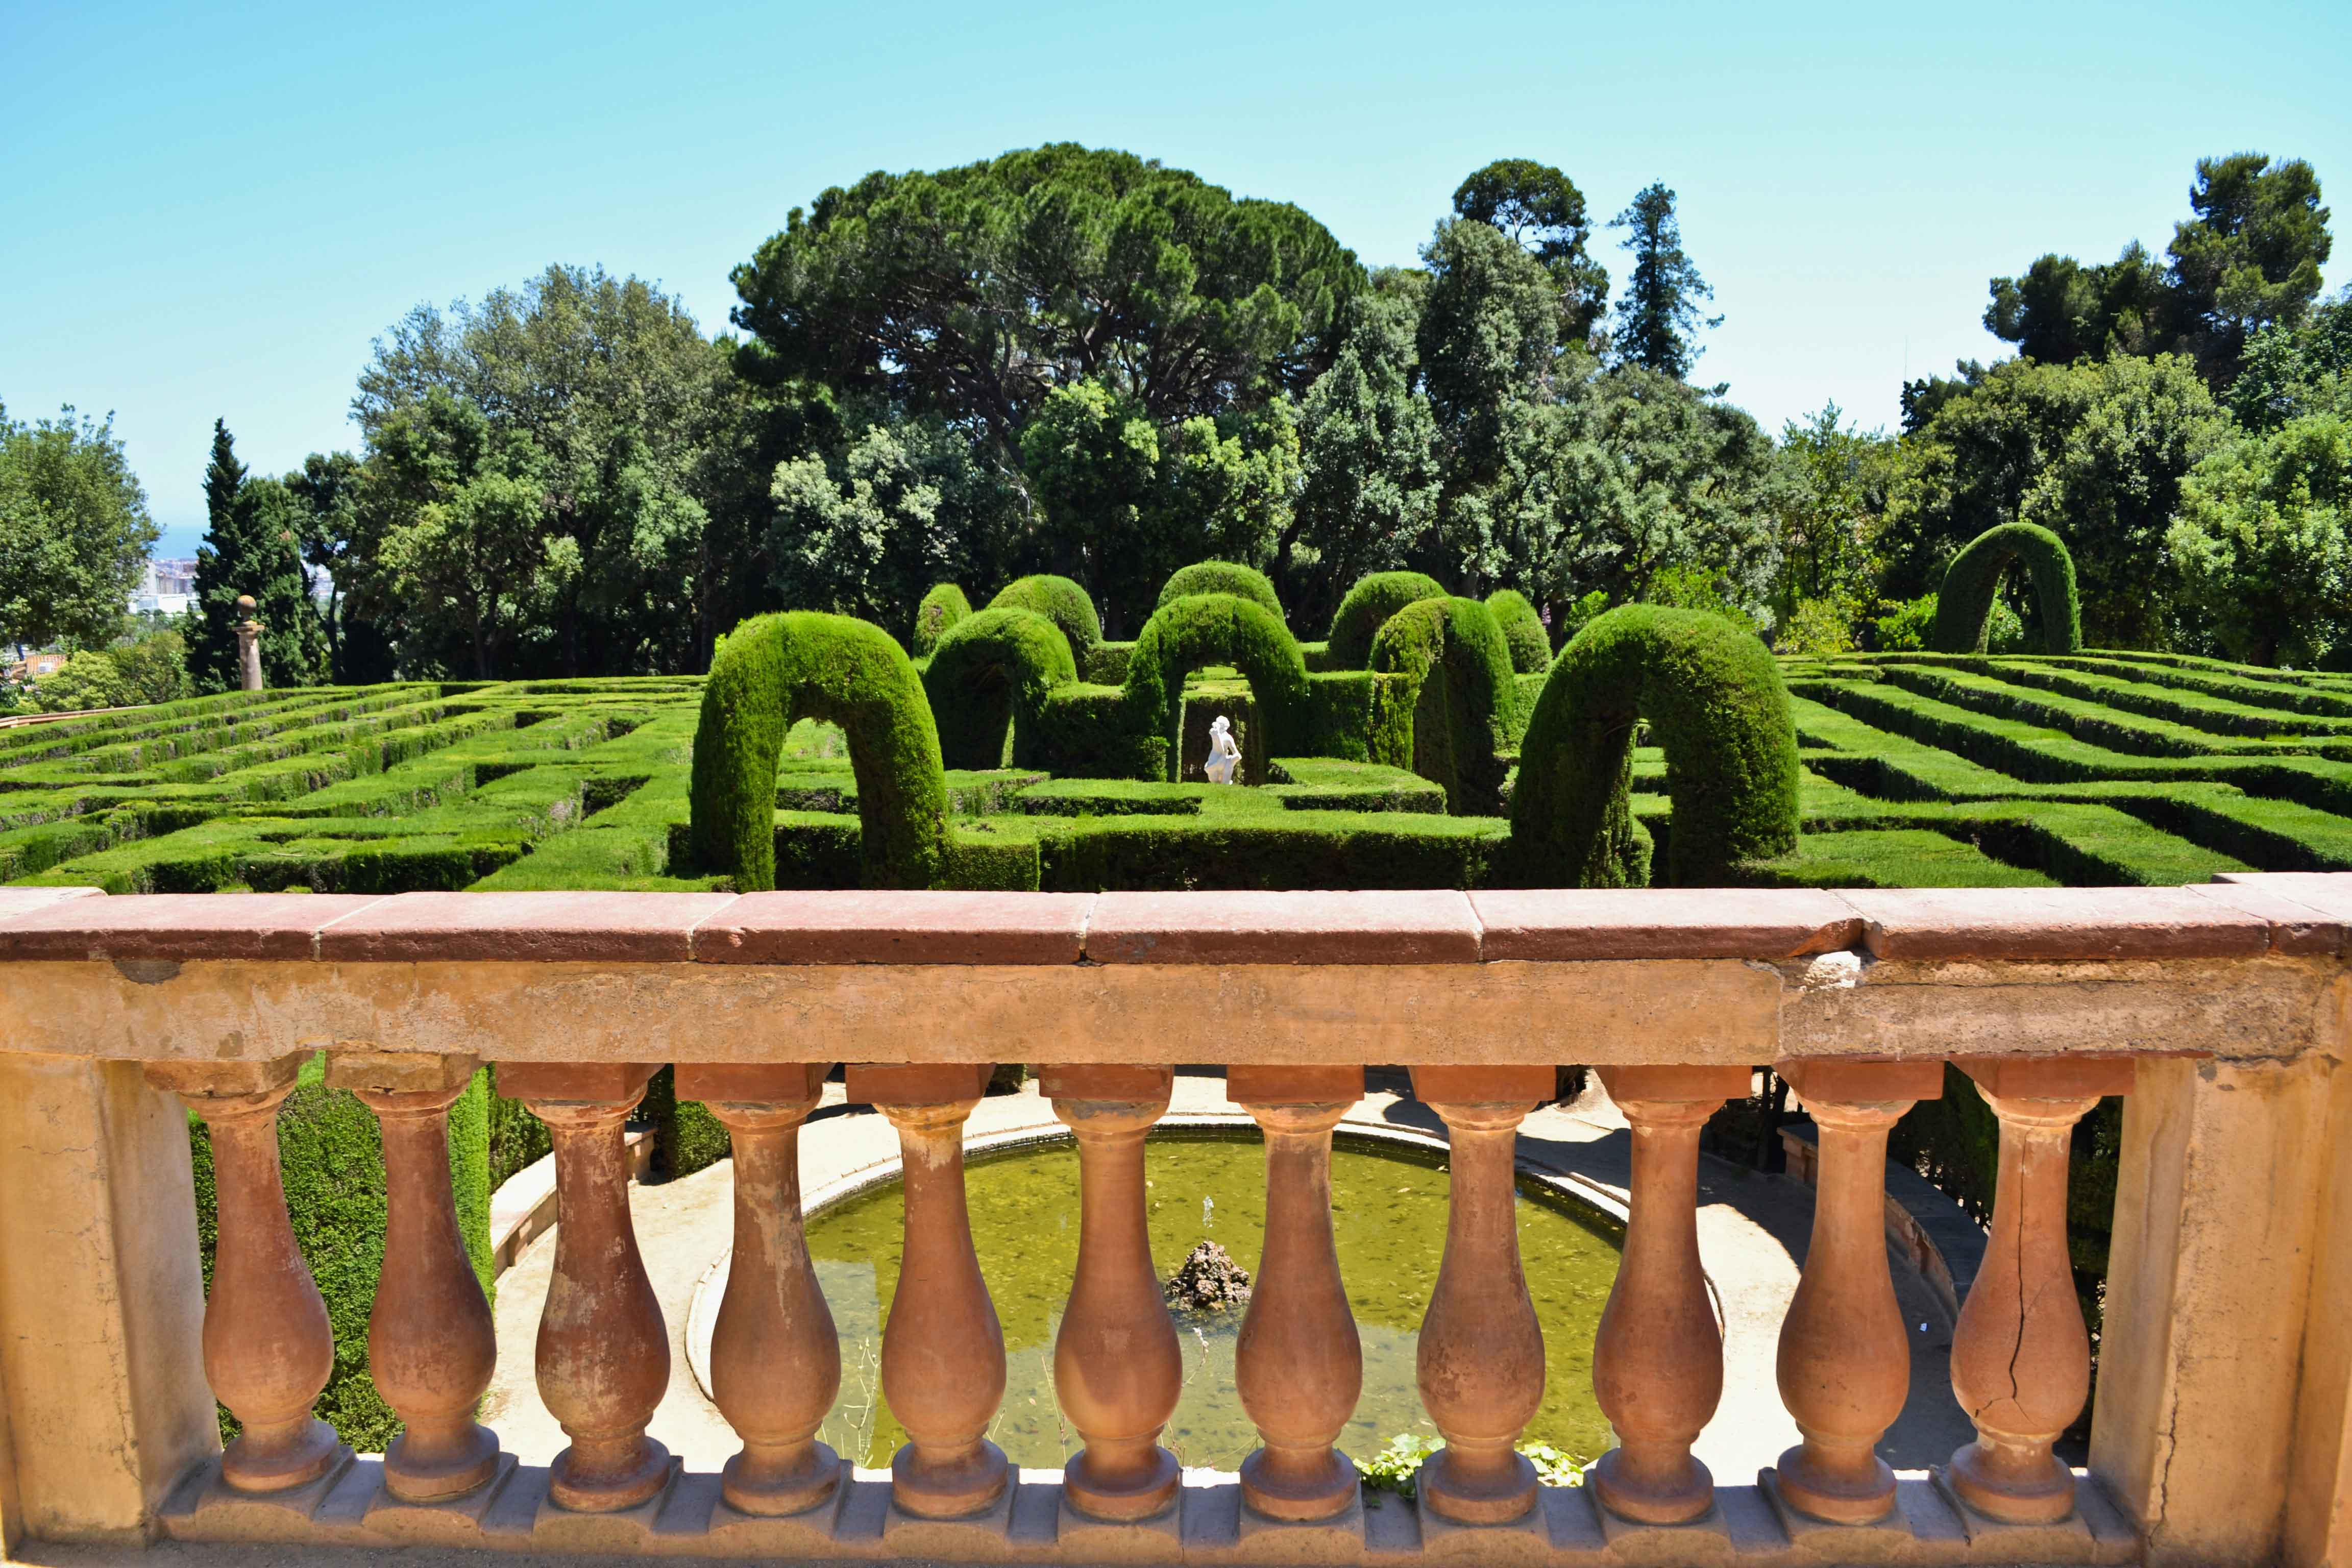 RHS Chelsea Flower Show | Labyrinth Park of Horta, Barcelona | Mr & Mrs Smith